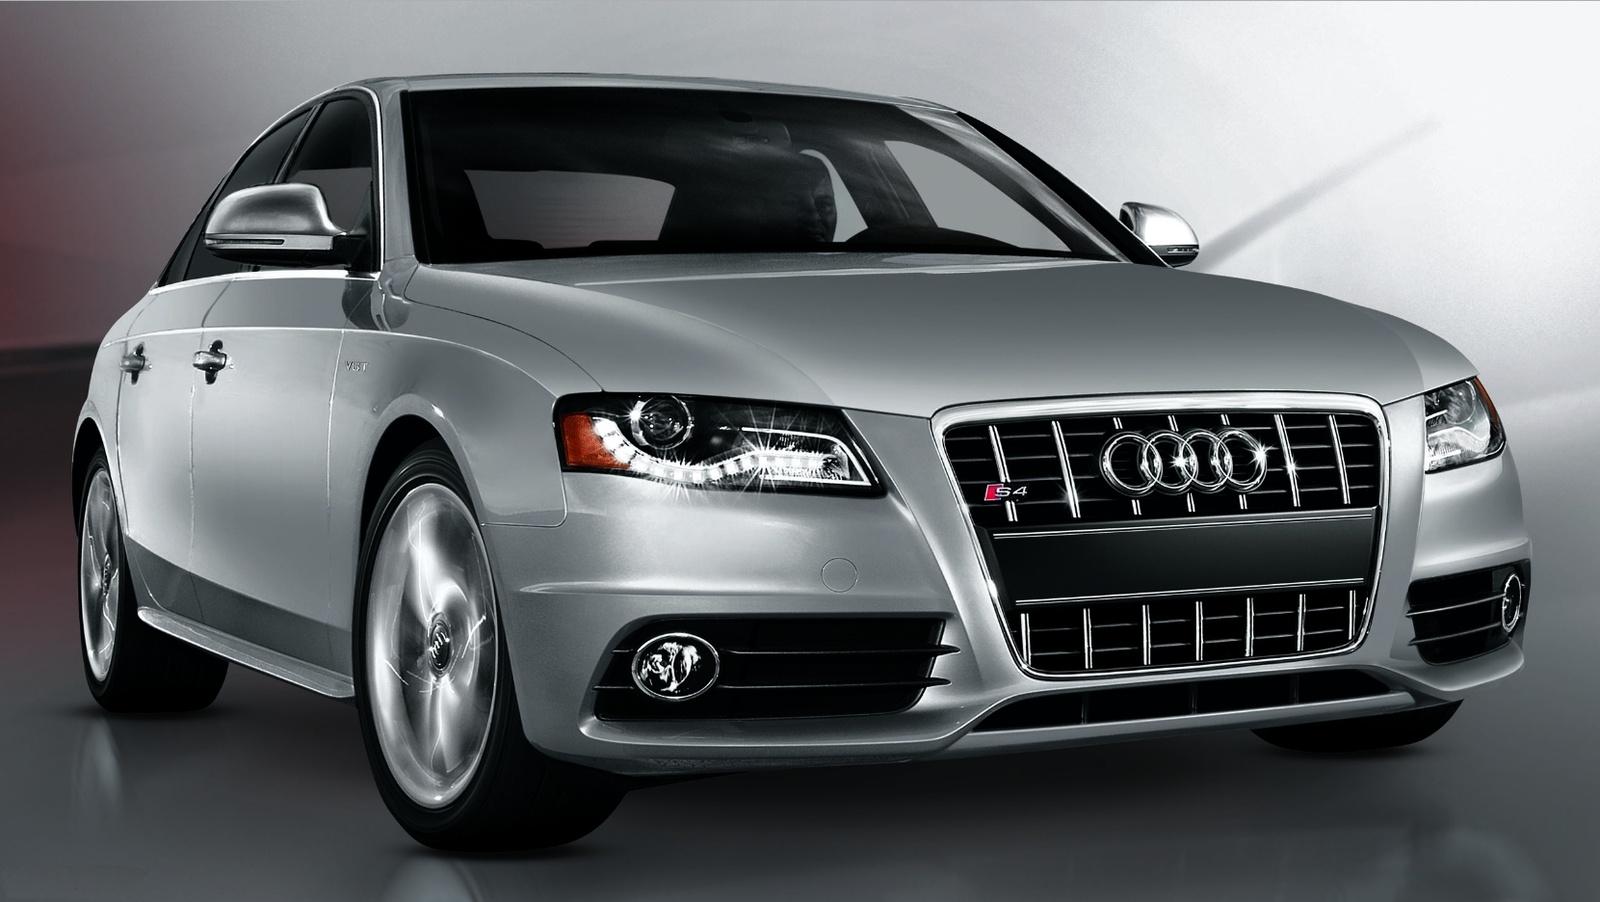 2010 Audi S4 Image 11